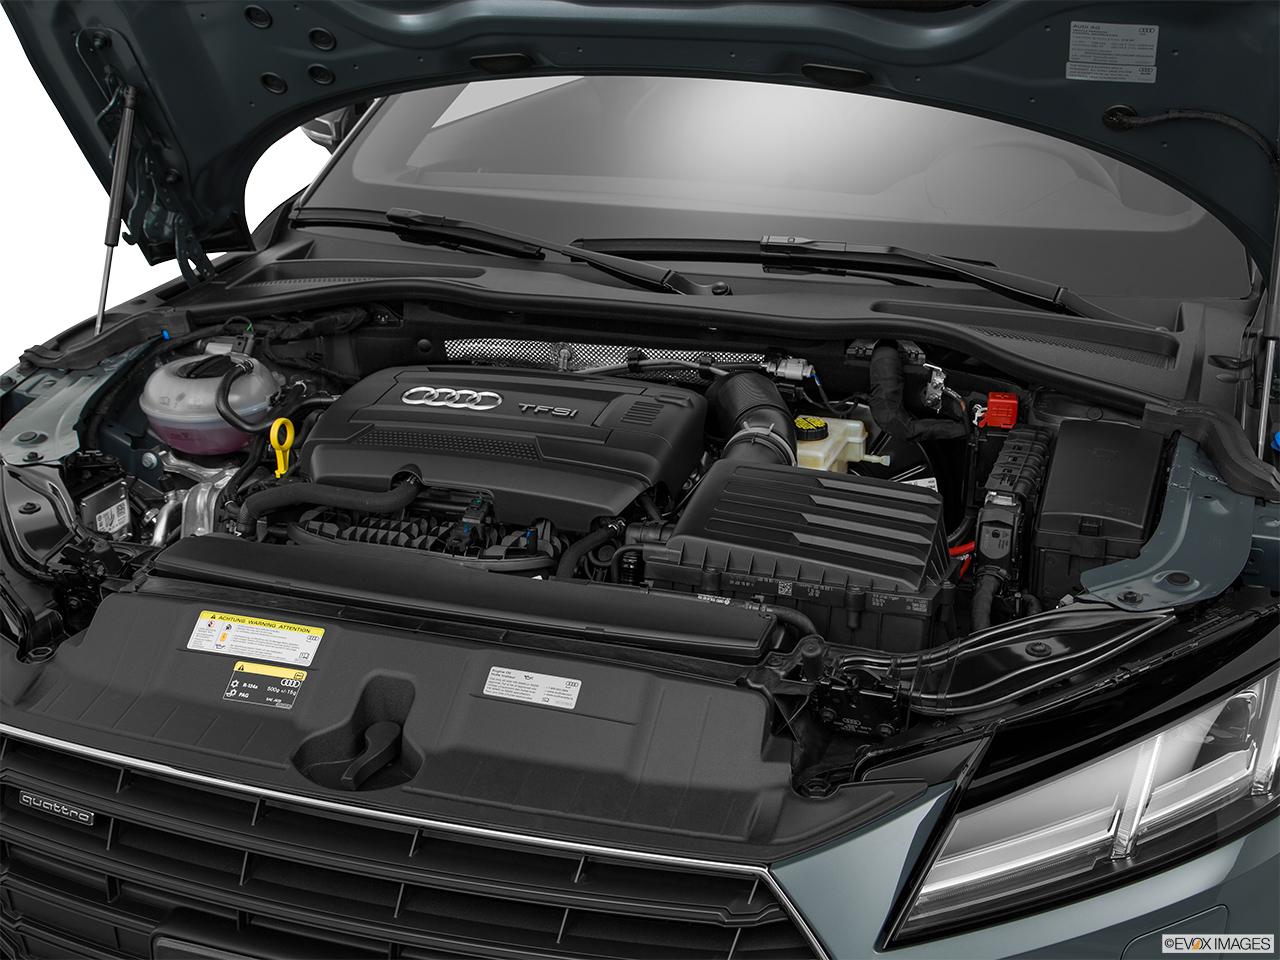 audi tt 2017 45 tfsi 230 hp in egypt new car prices. Black Bedroom Furniture Sets. Home Design Ideas